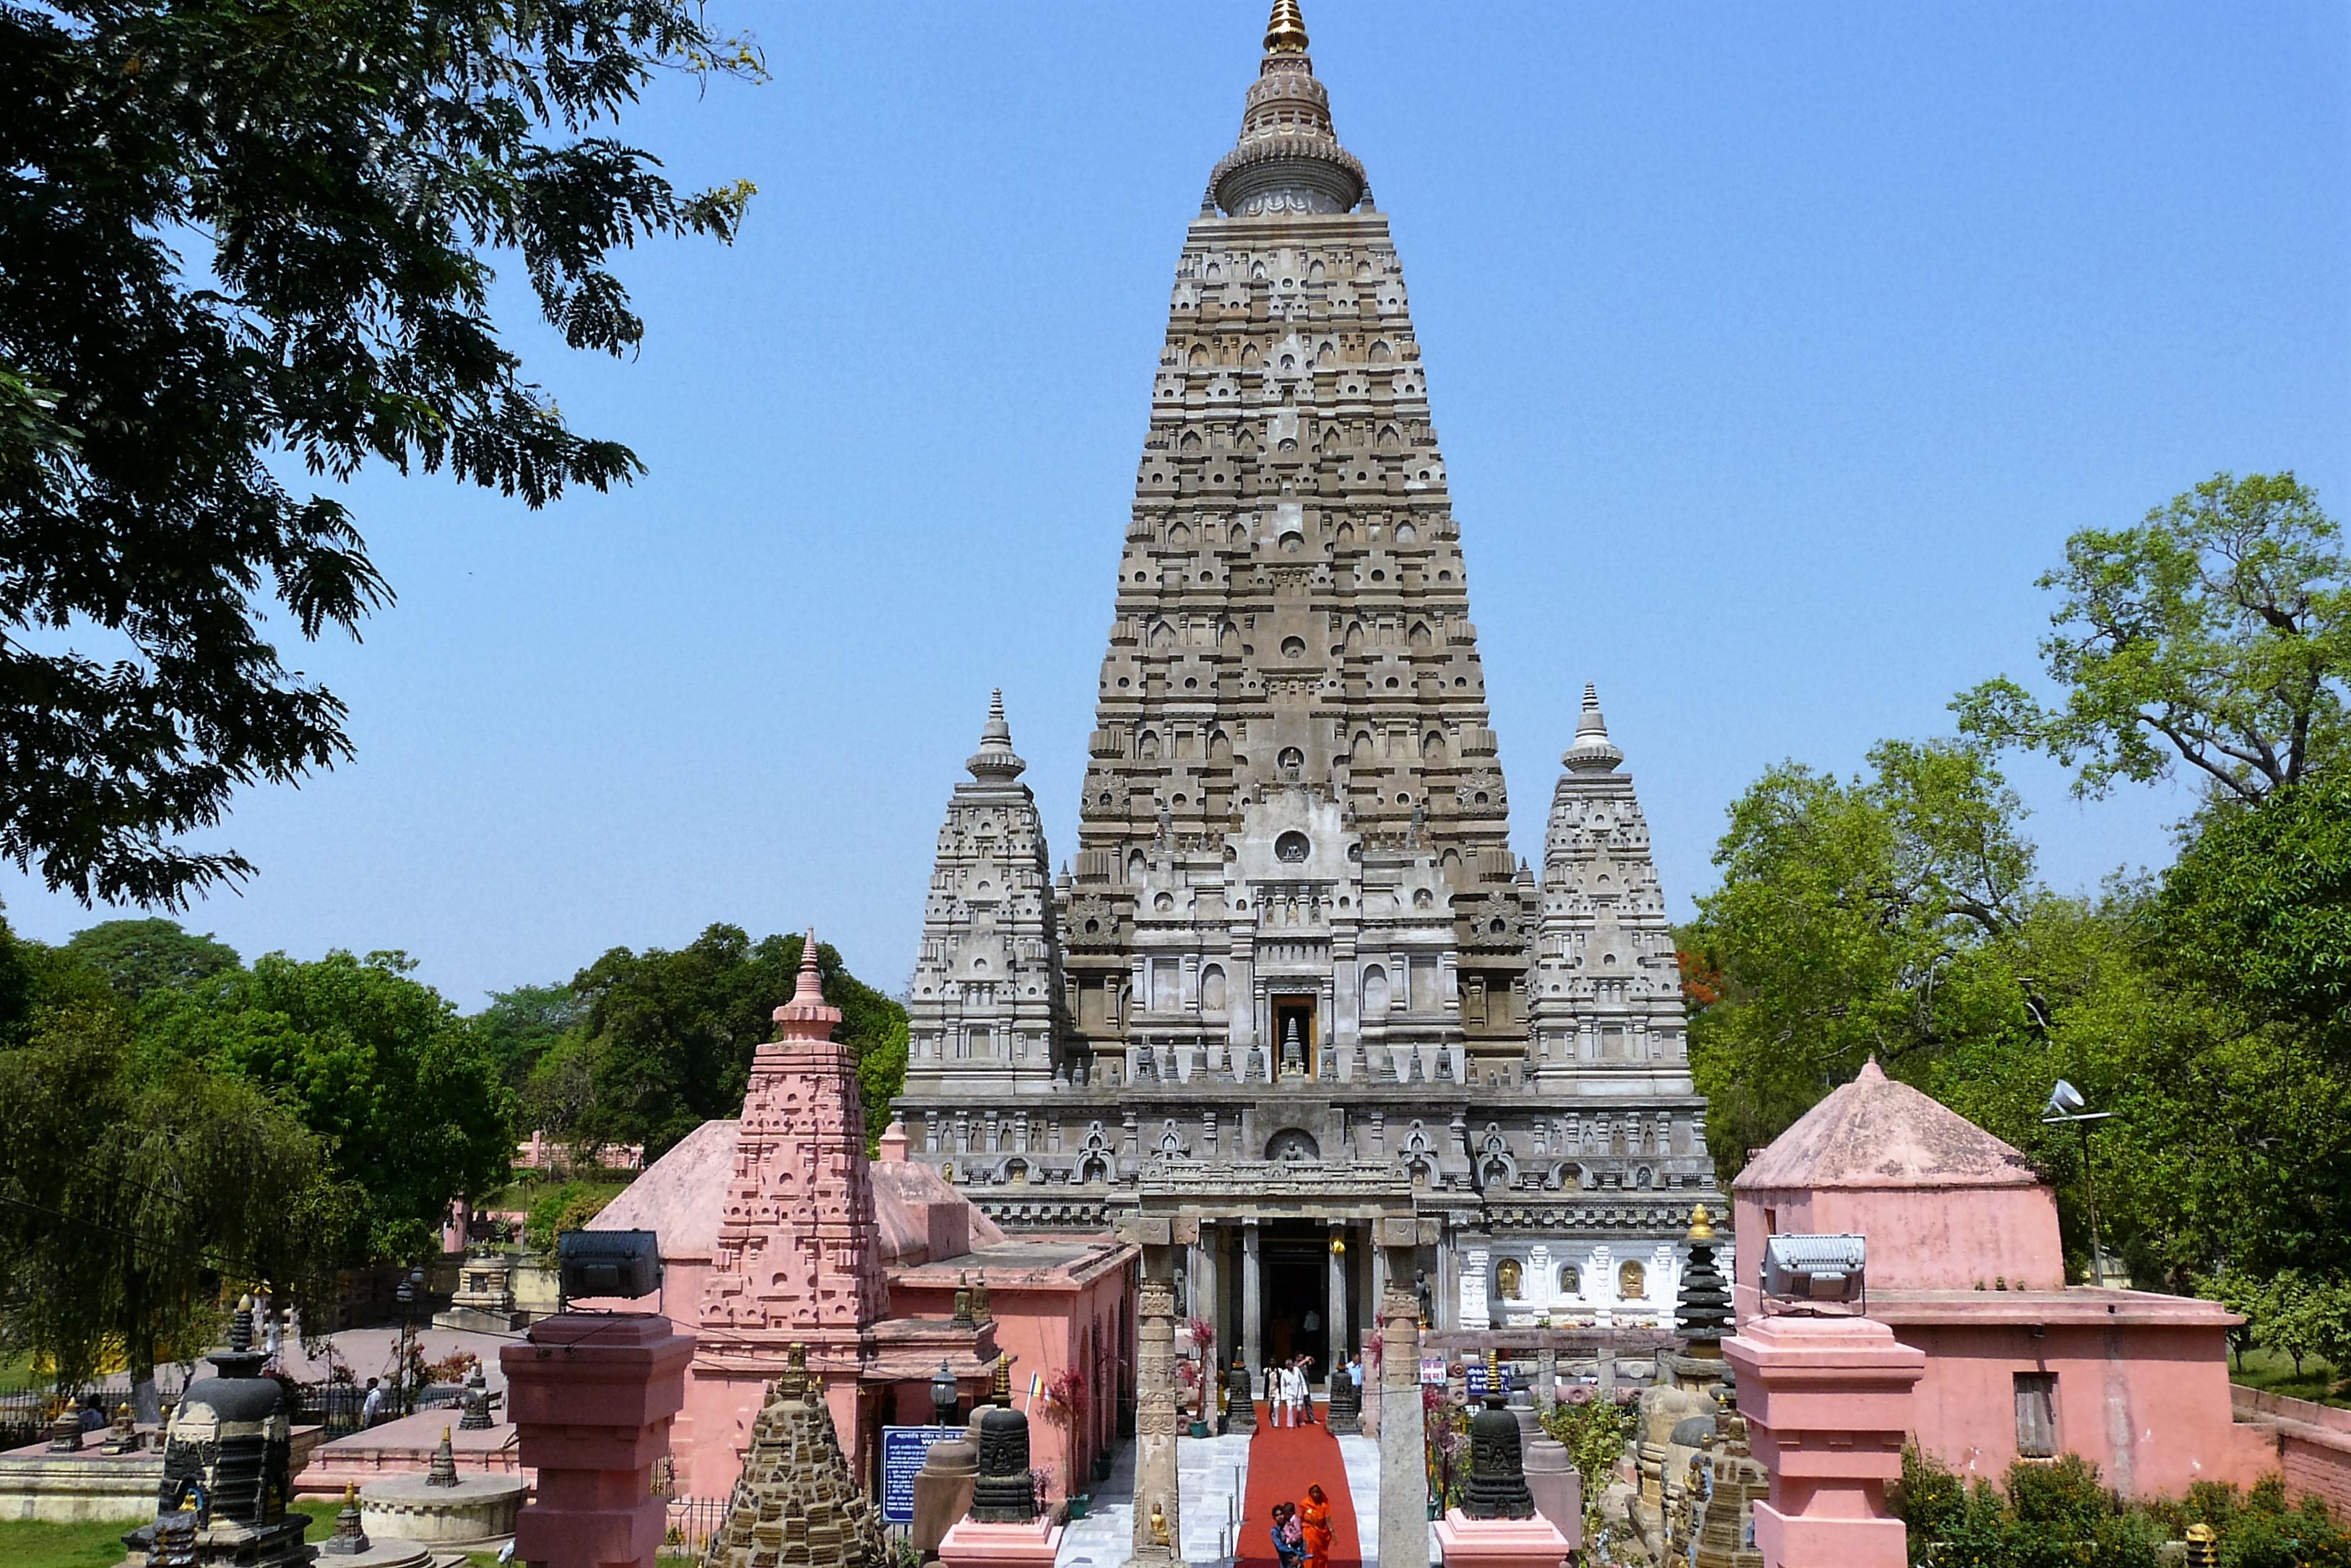 Bodhgaya, Mahabodhi Temple